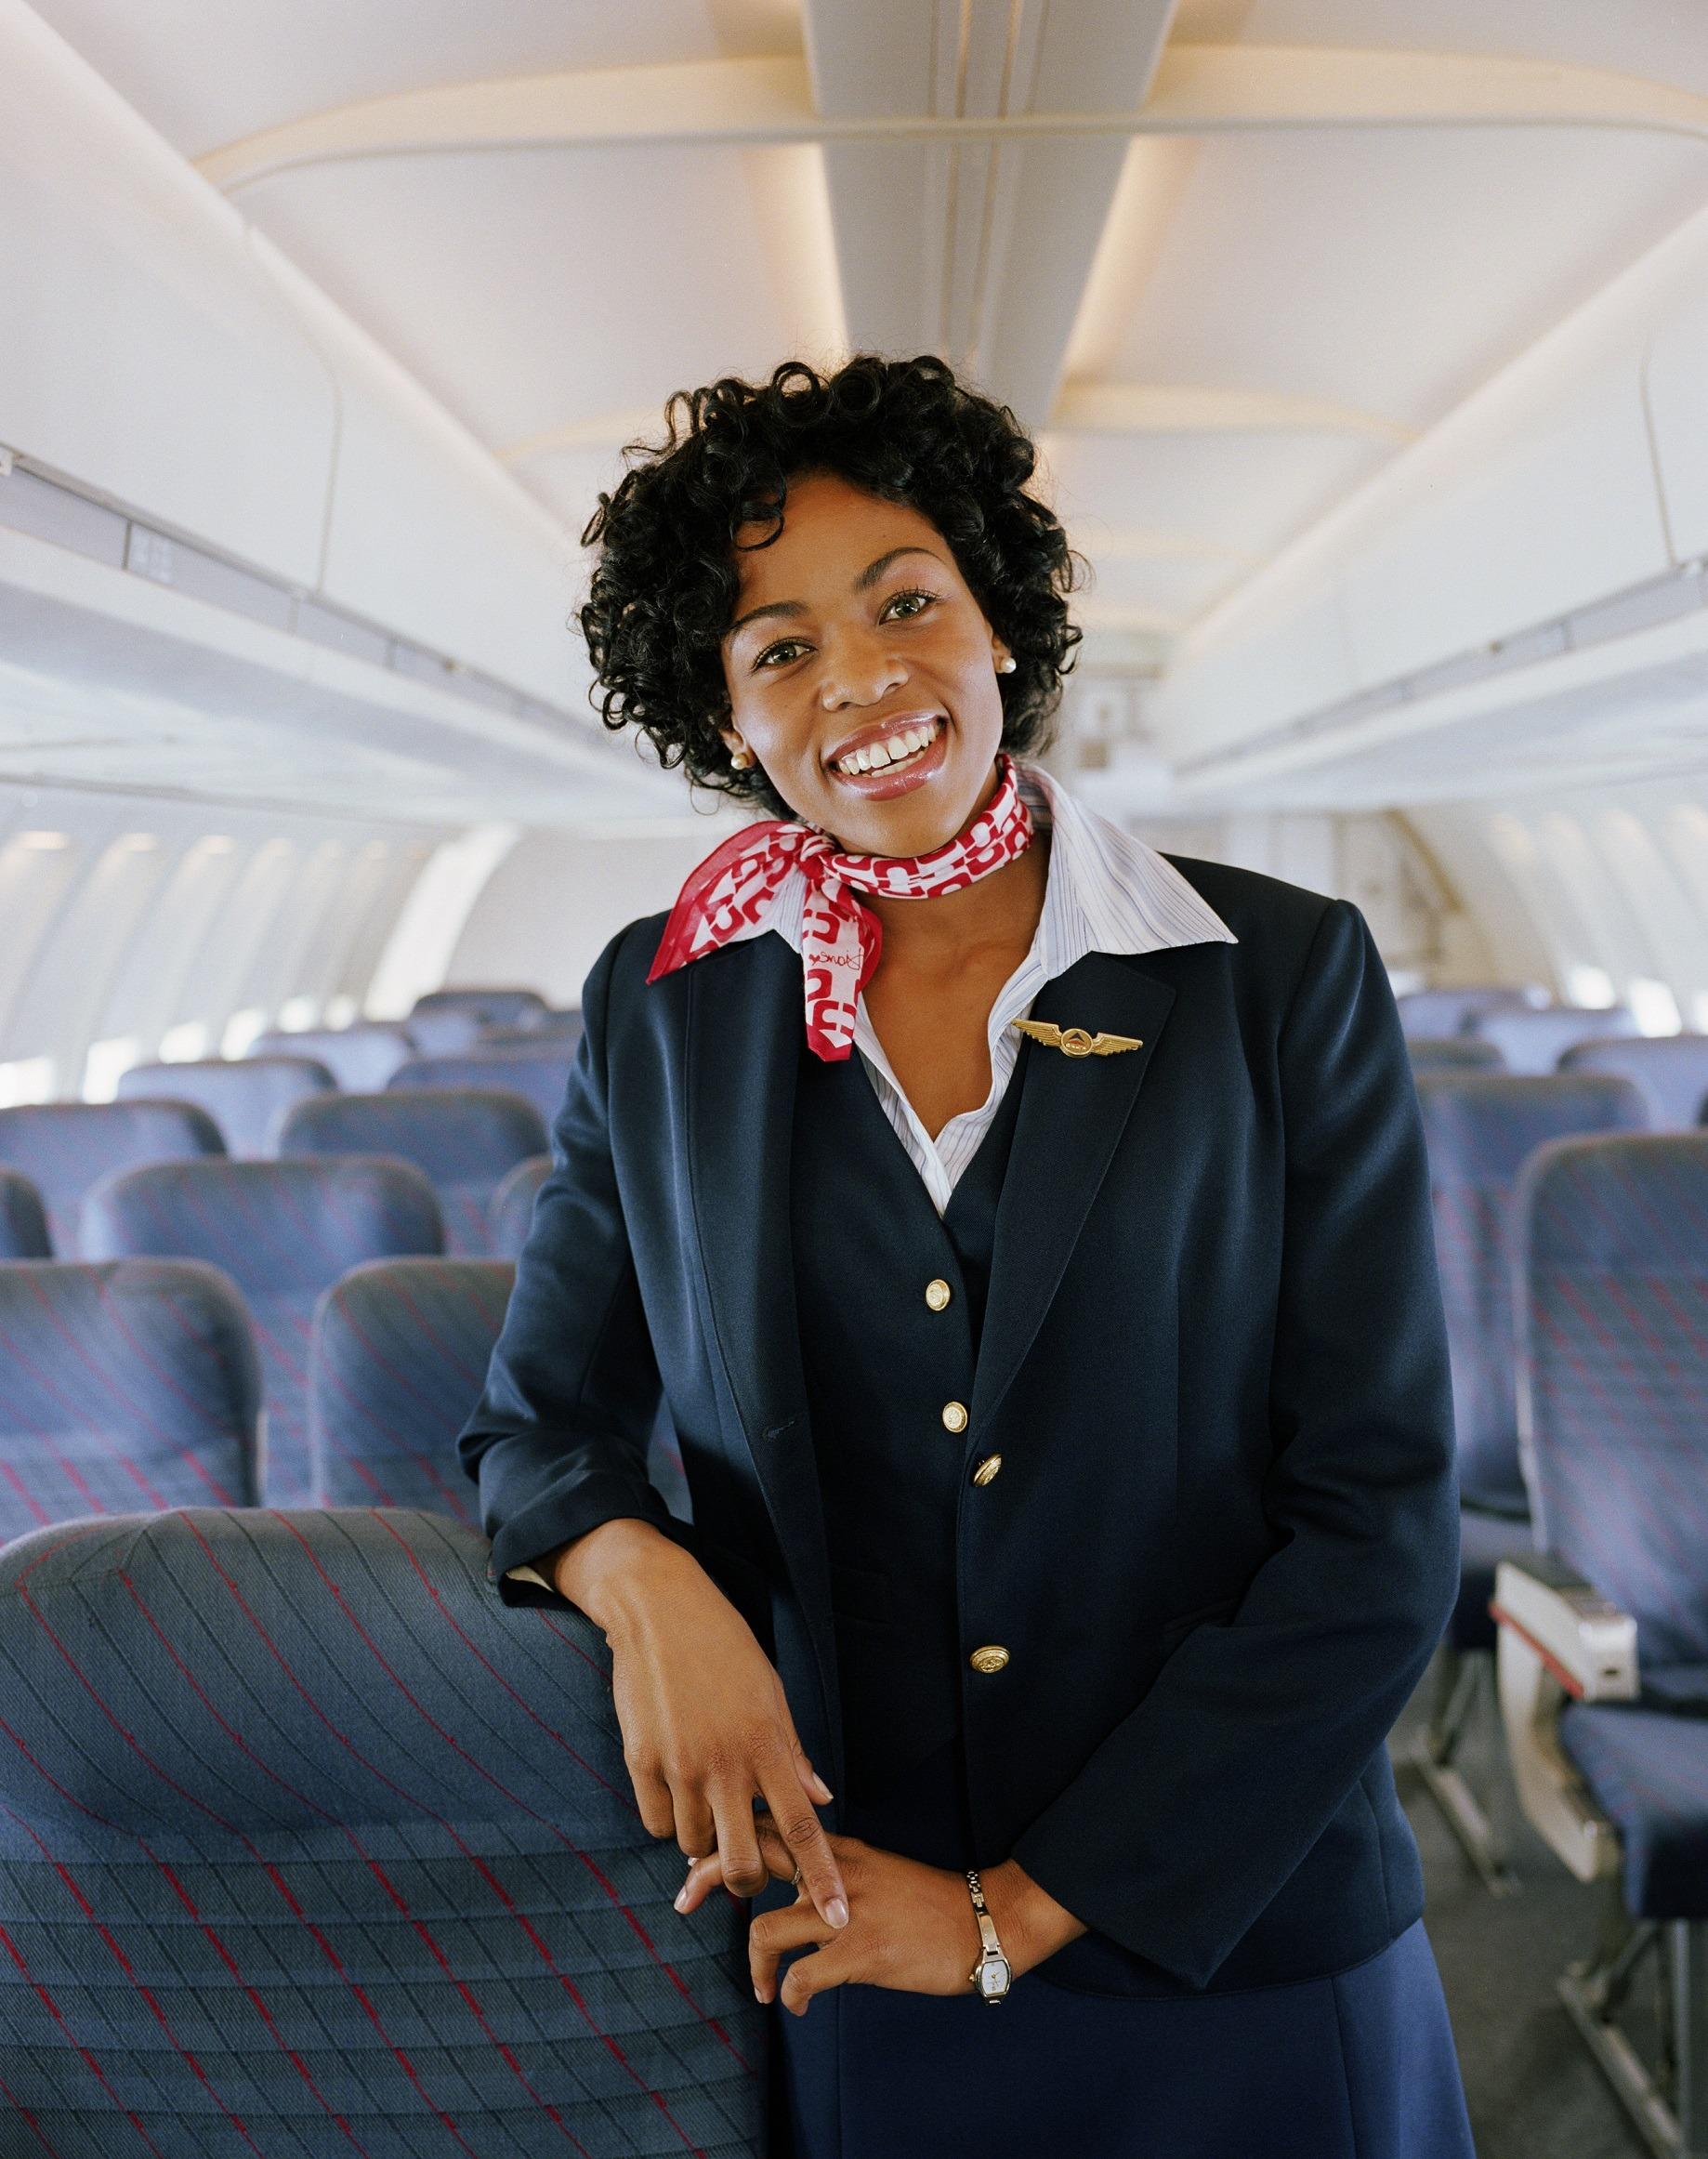 Woman flight attendant